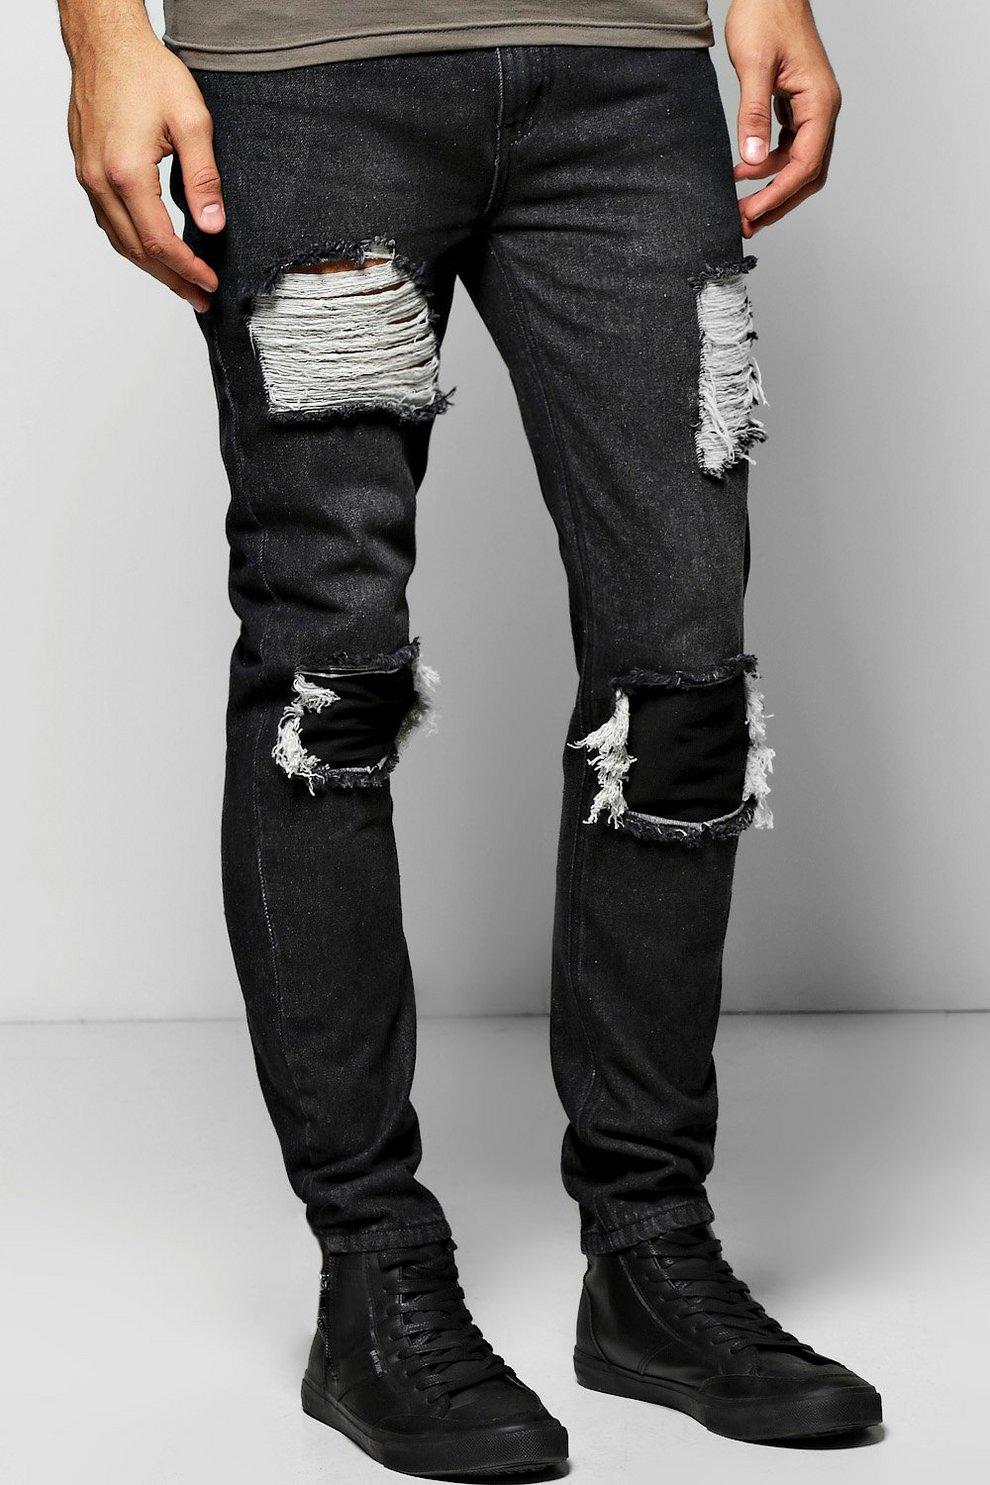 9a969e3fe8f7 Skinny Fit Rigid Rip And Repair Jeans | Boohoo